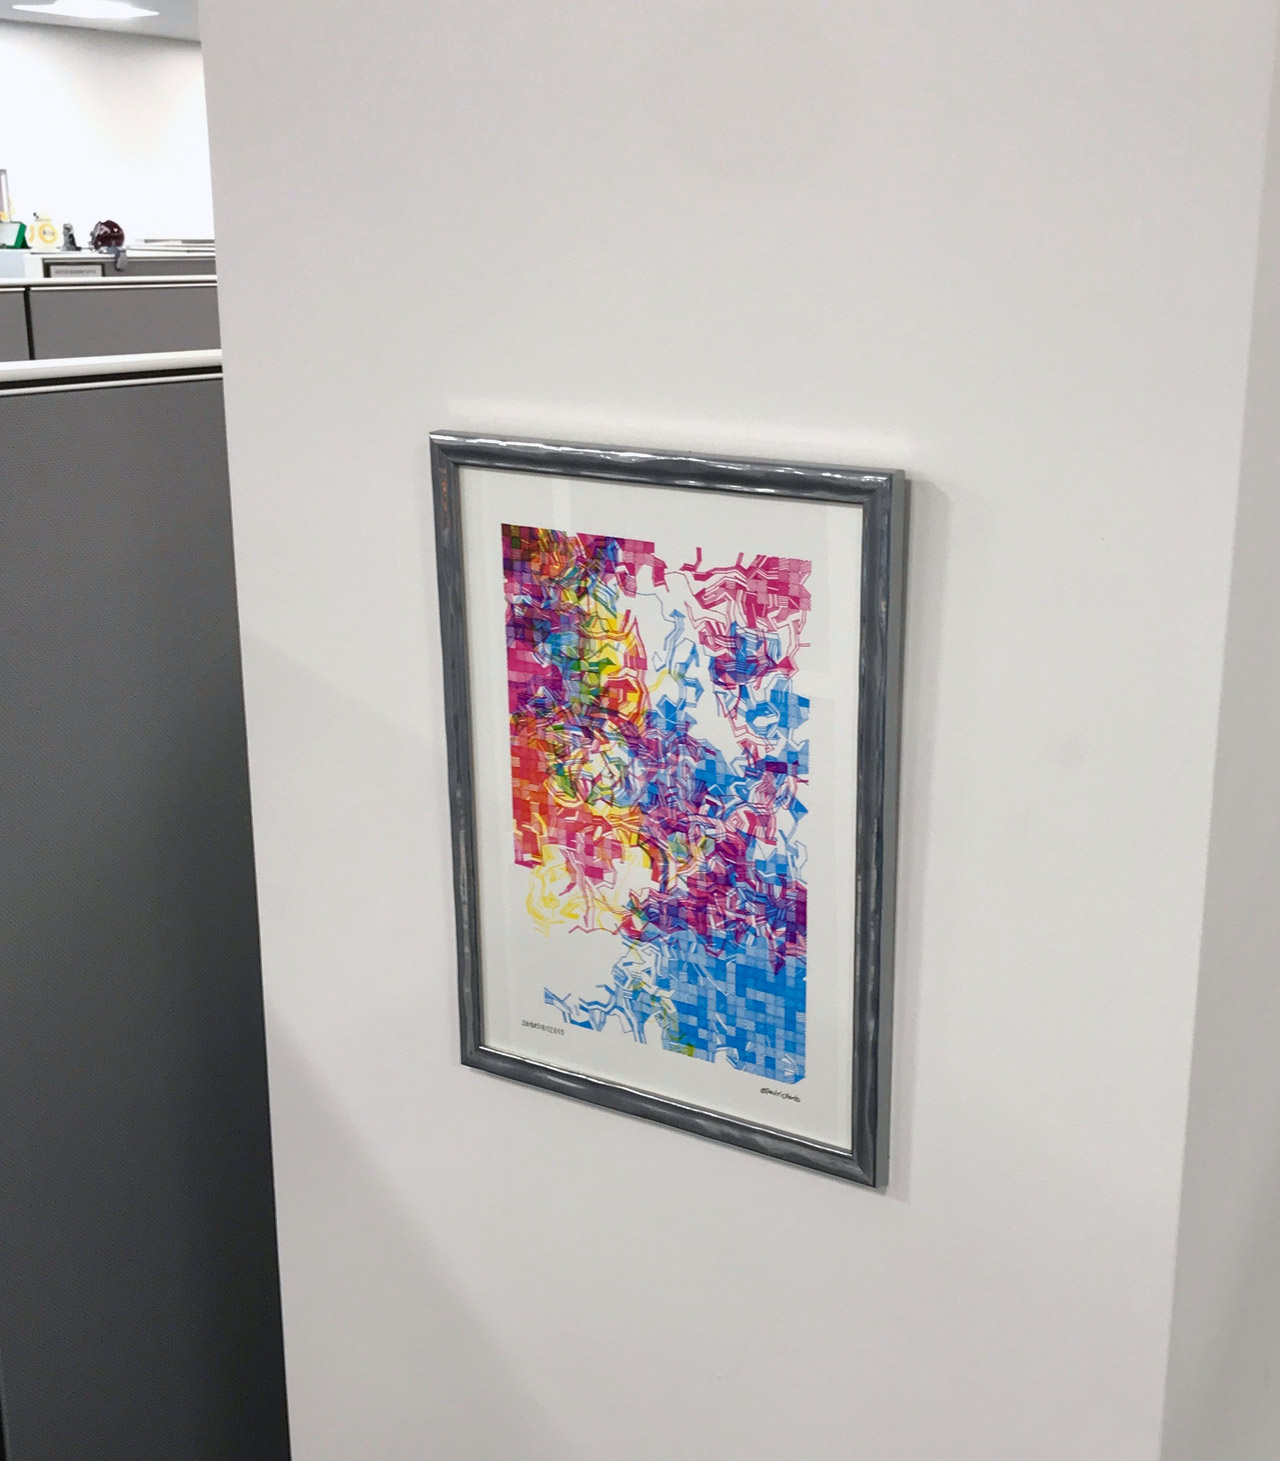 Plotter printout artwork by Paul Rickards